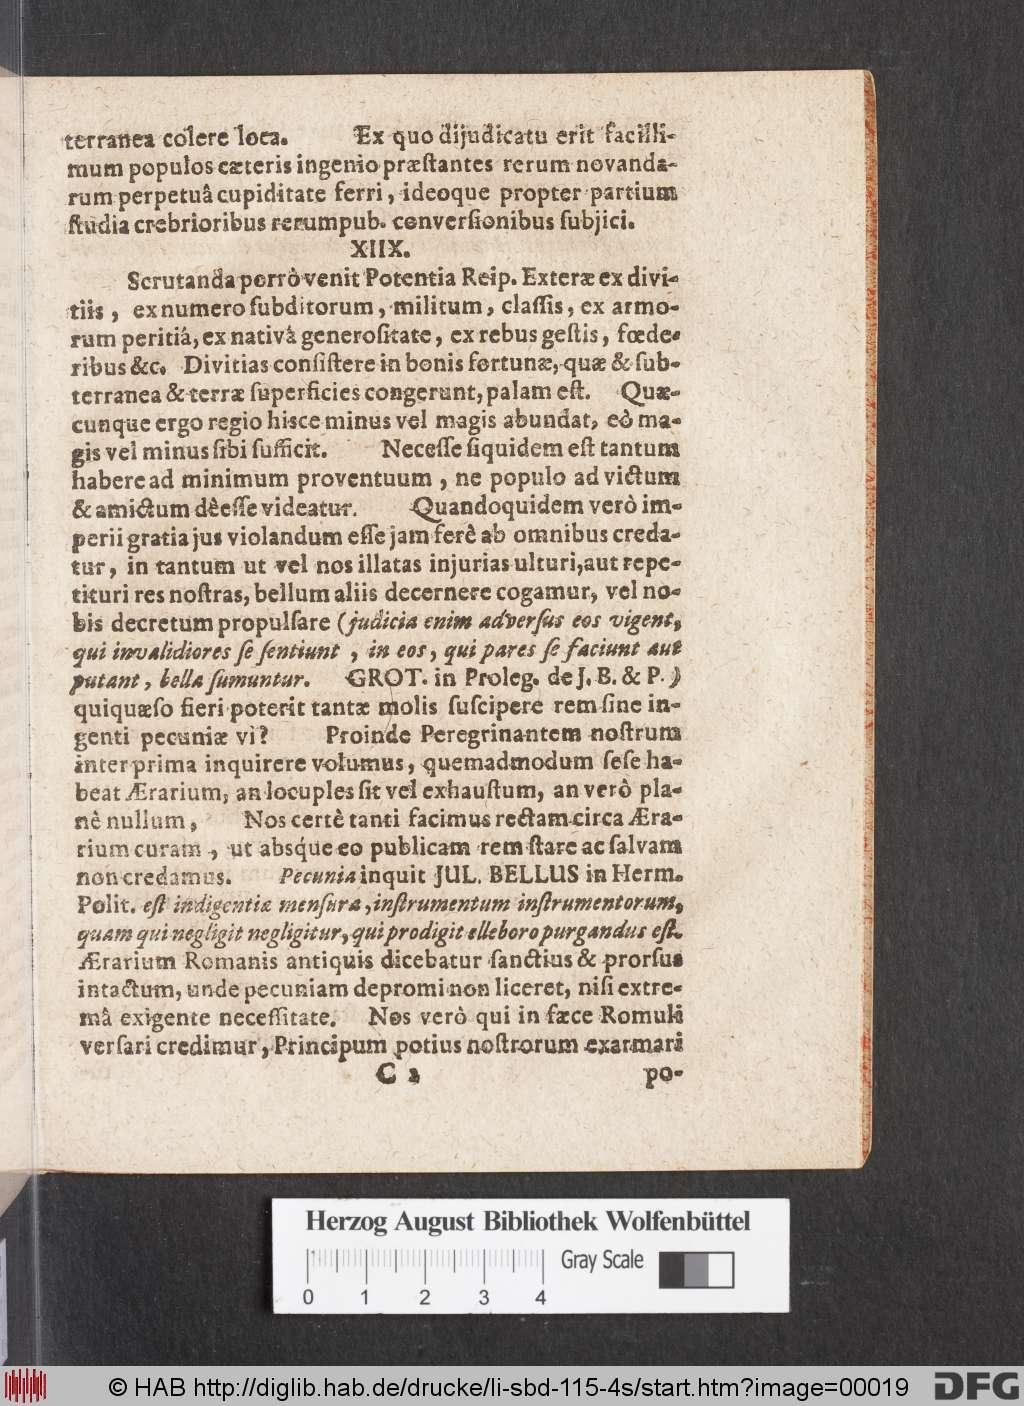 http://diglib.hab.de/drucke/li-sbd-115-4s/00019.jpg